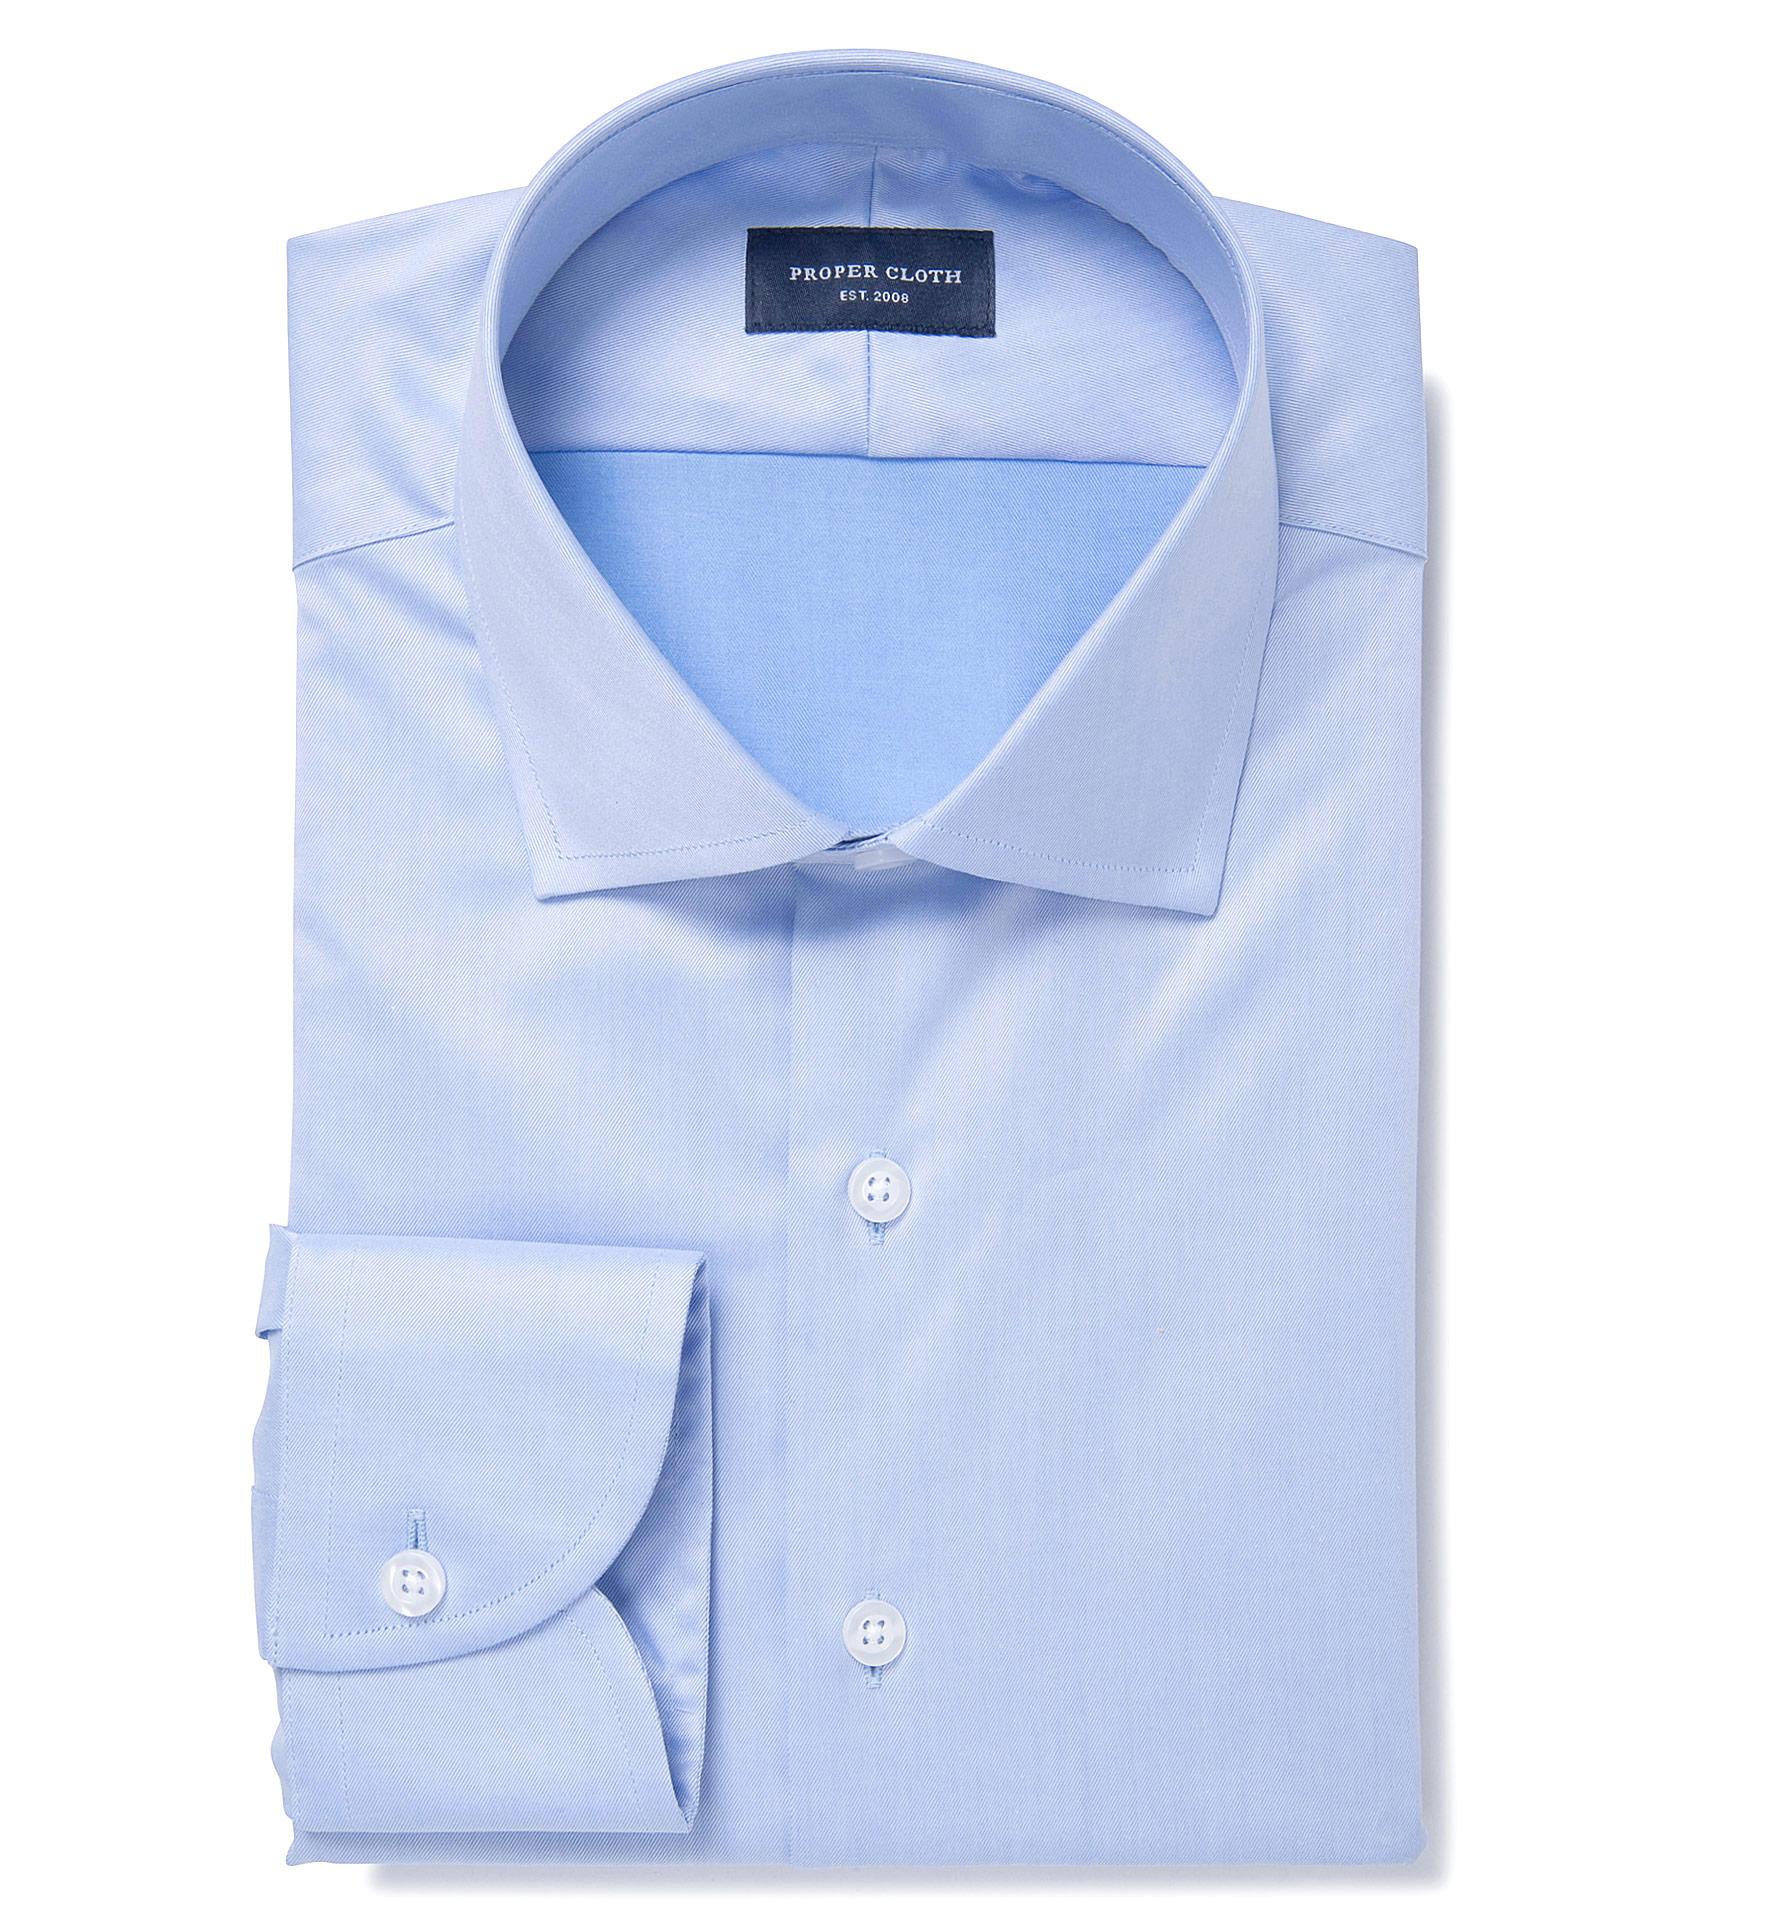 Hudson blue wrinkle resistant twill men 39 s dress shirt by for Wrinkle resistant dress shirts